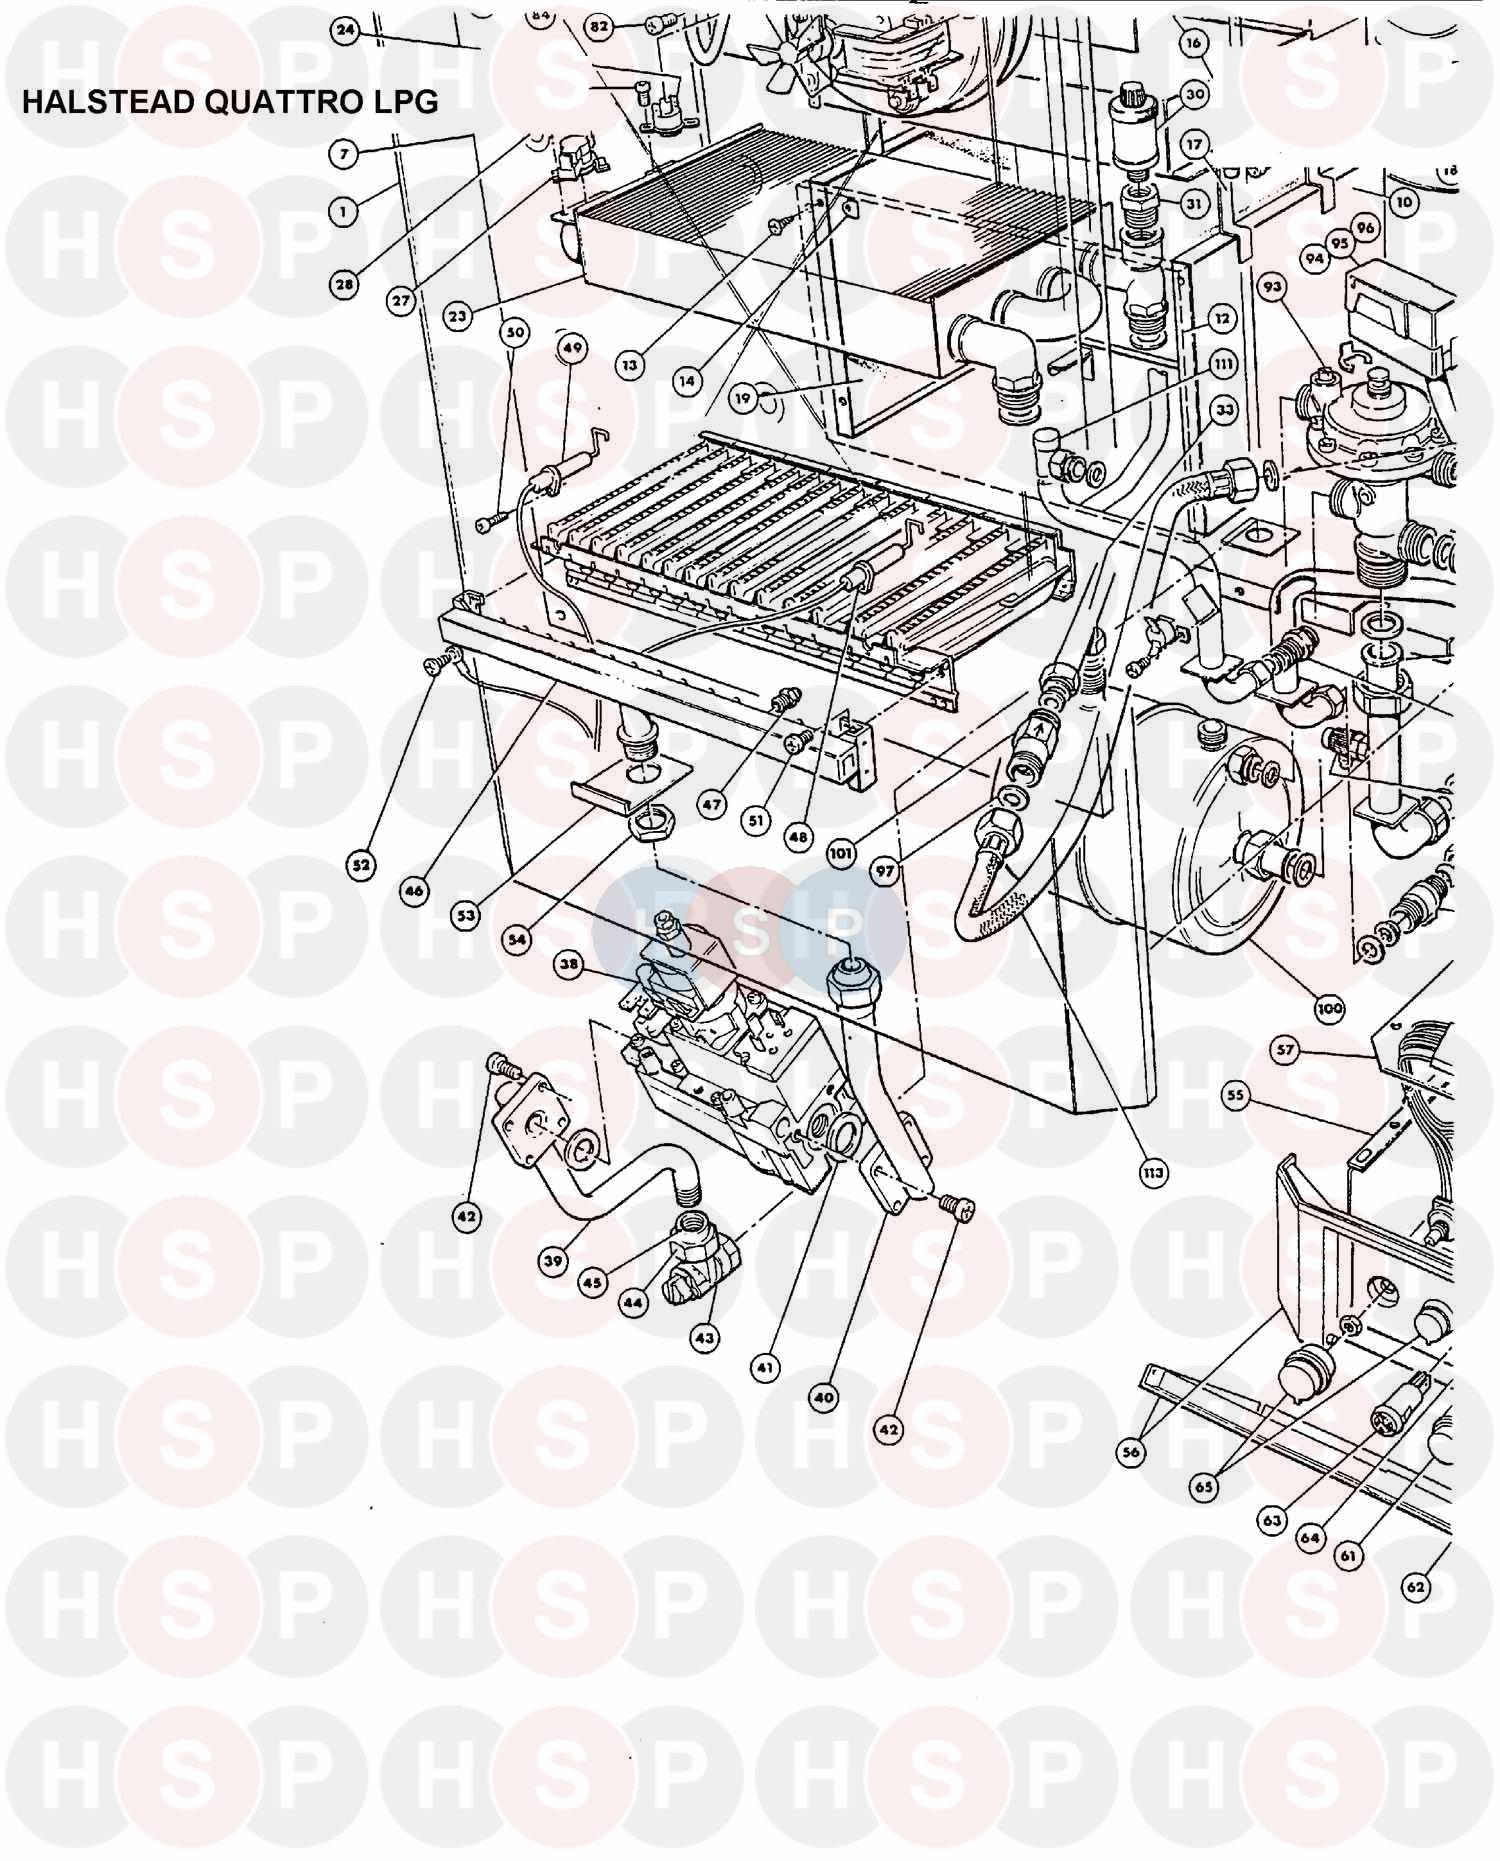 BOILER ASSEMBLY 2 diagram for Halstead QUATTRO LPG